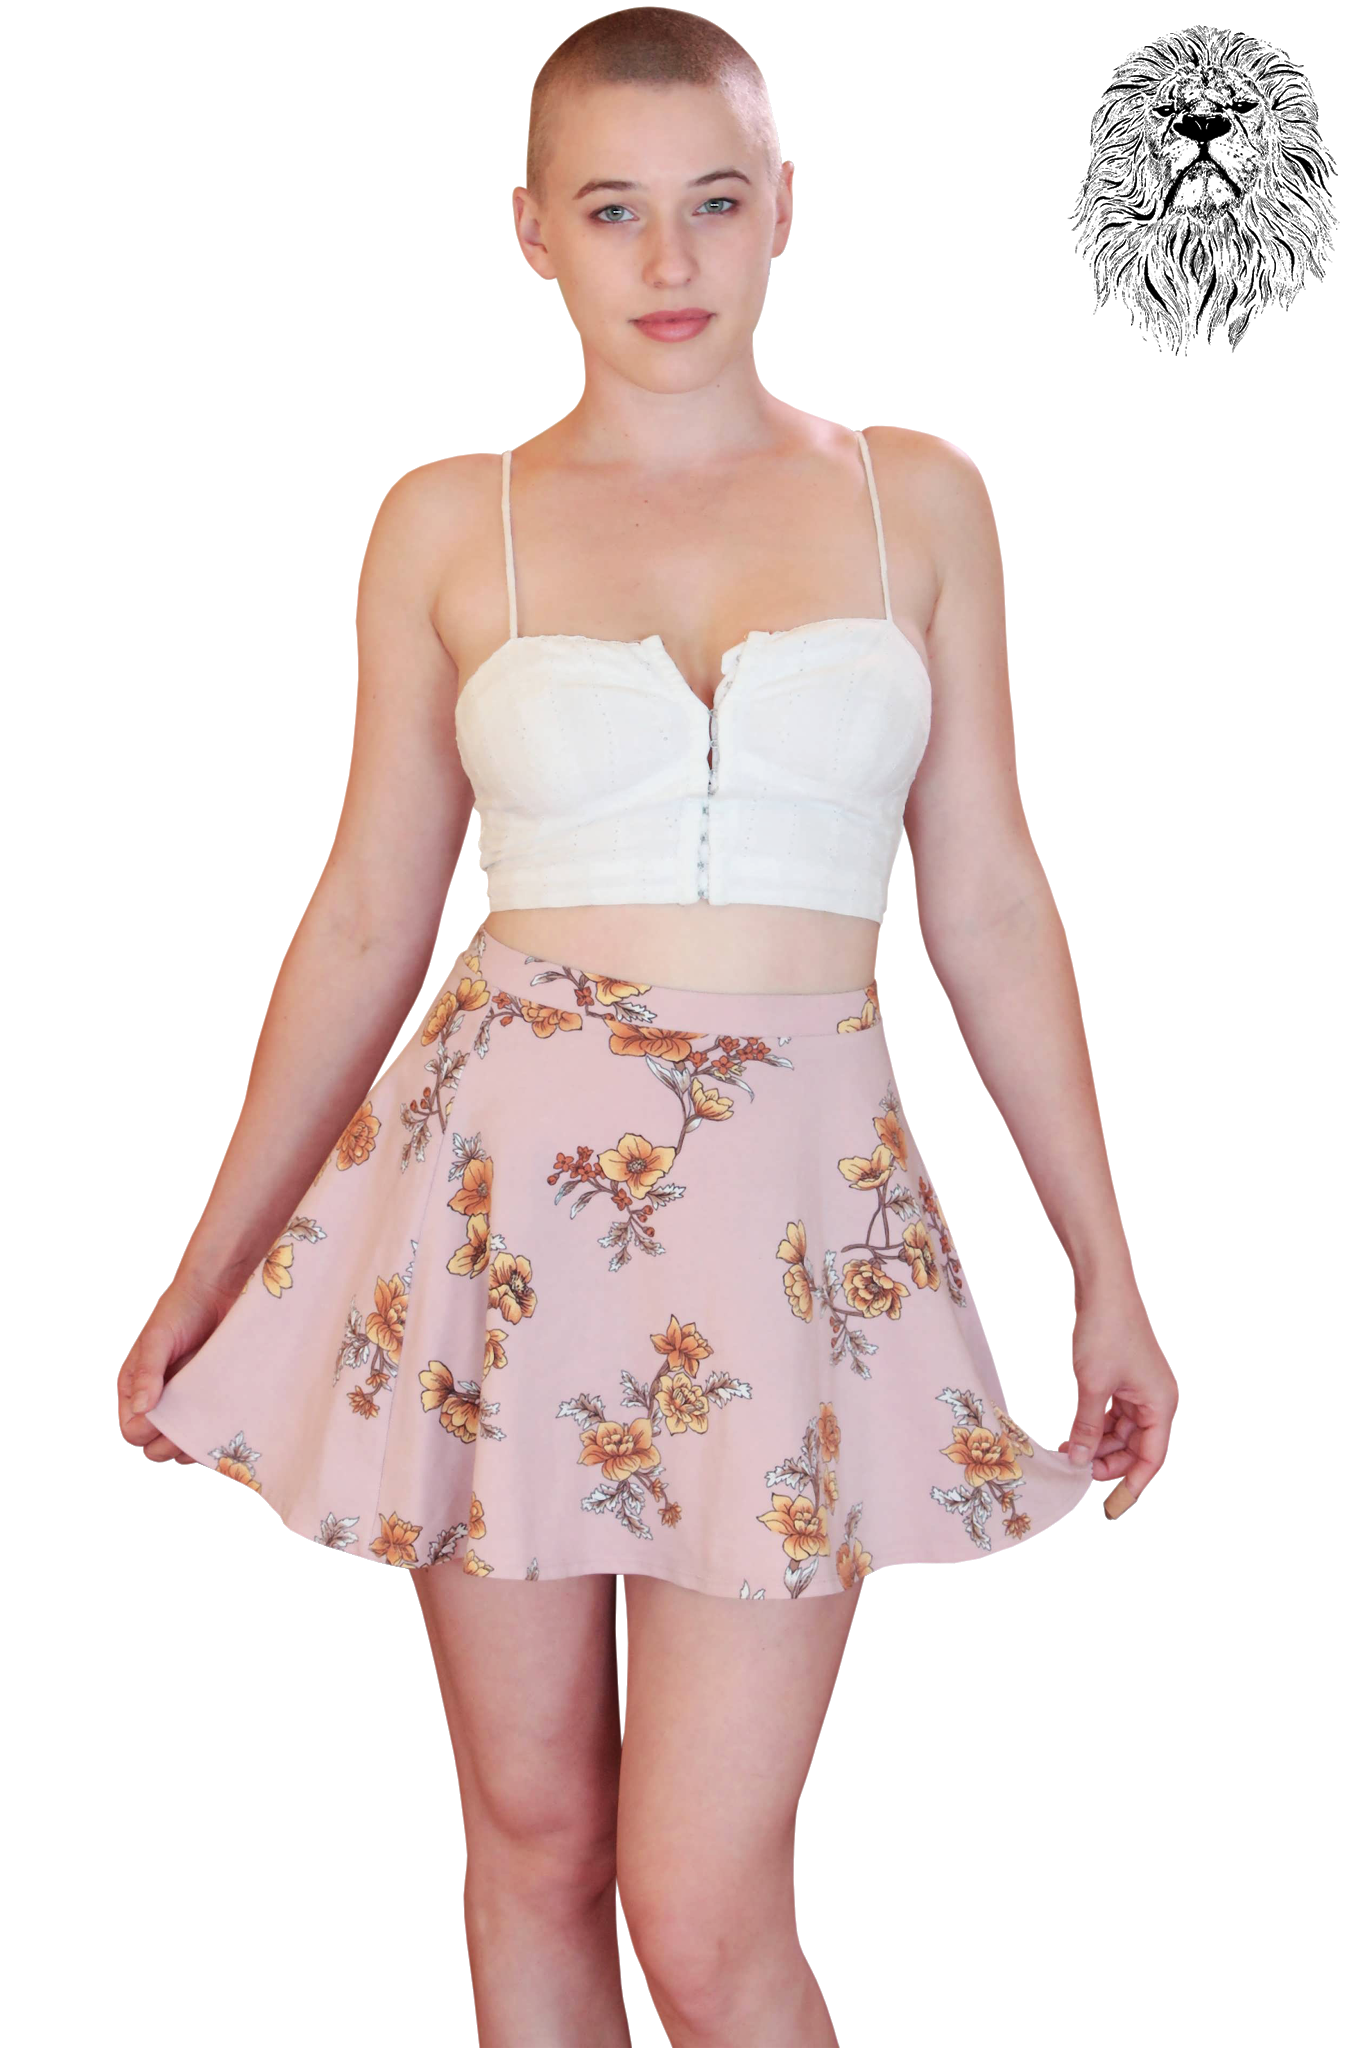 Models - Riley Nixon - Cute Riley (1)